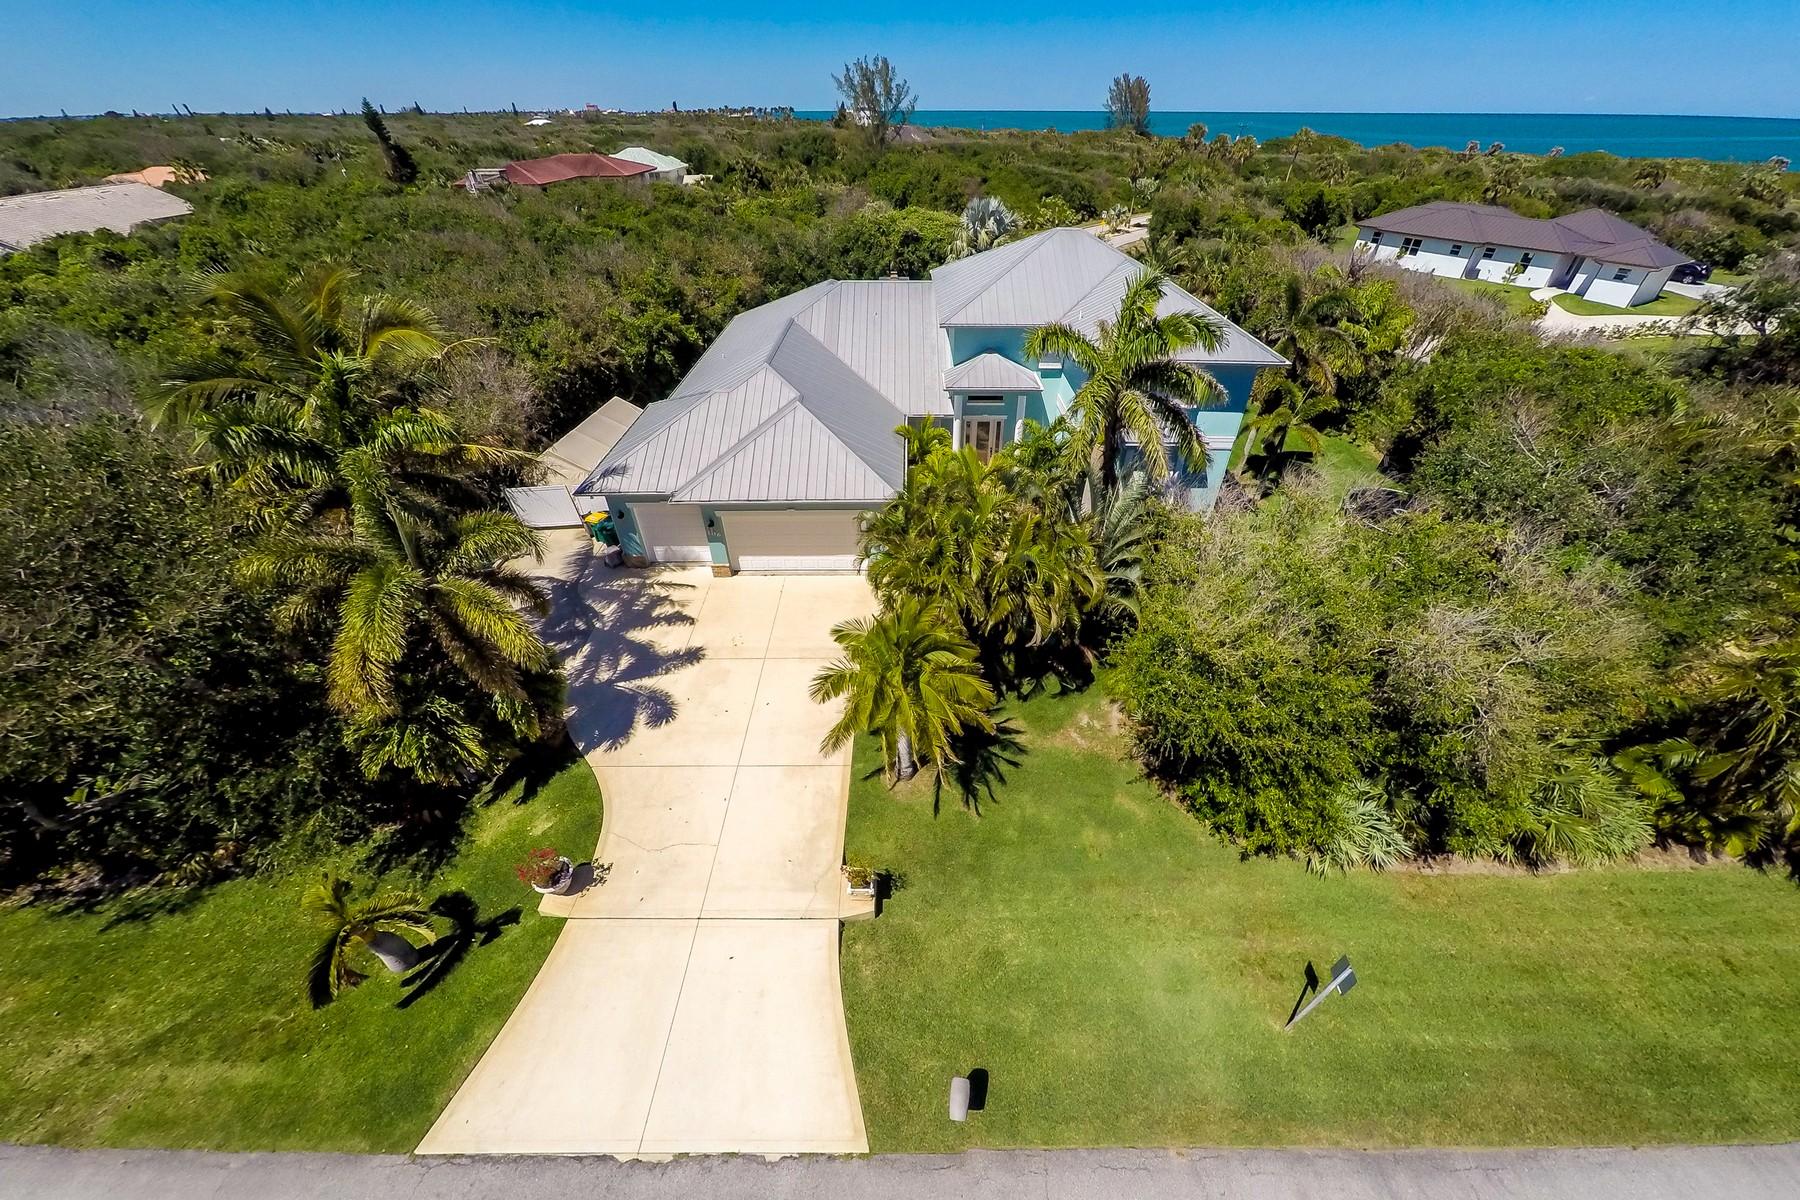 Single Family Home for Sale at 106 Regatta Street Melbourne Beach, Florida, 32951 United States